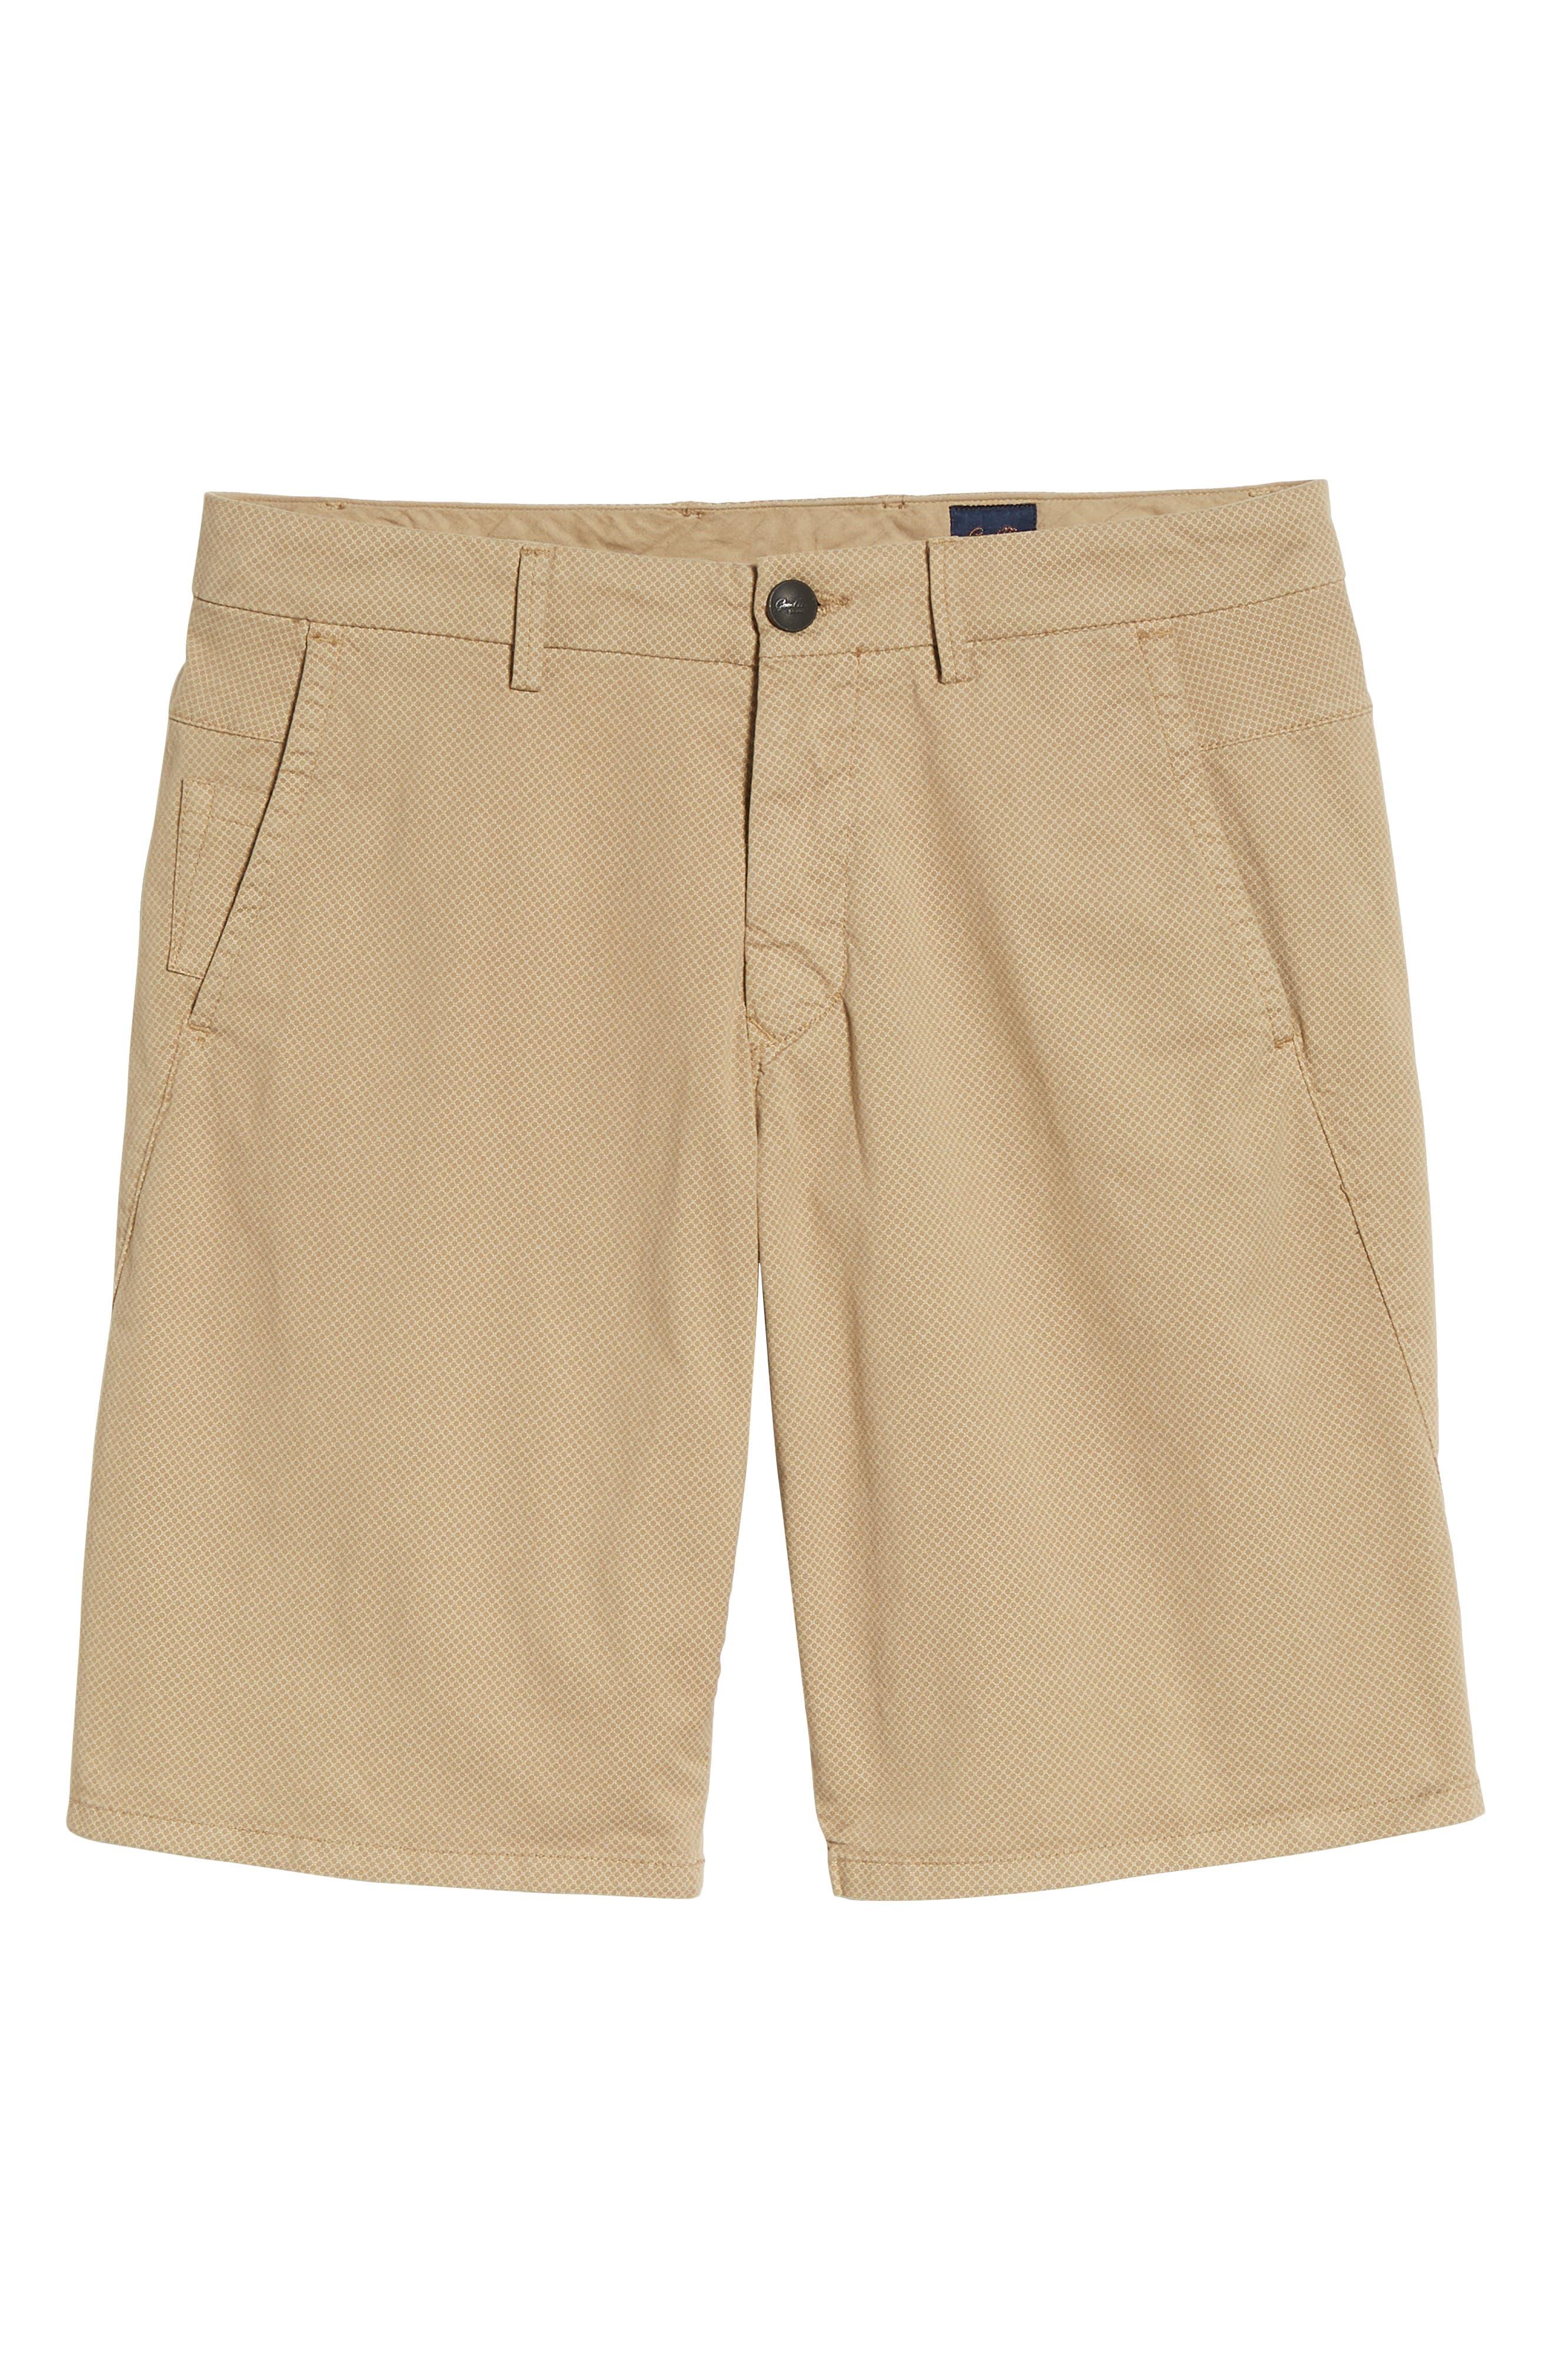 Monaco Diamond Dash Modern Fit Chino Shorts,                             Alternate thumbnail 6, color,                             Khaki